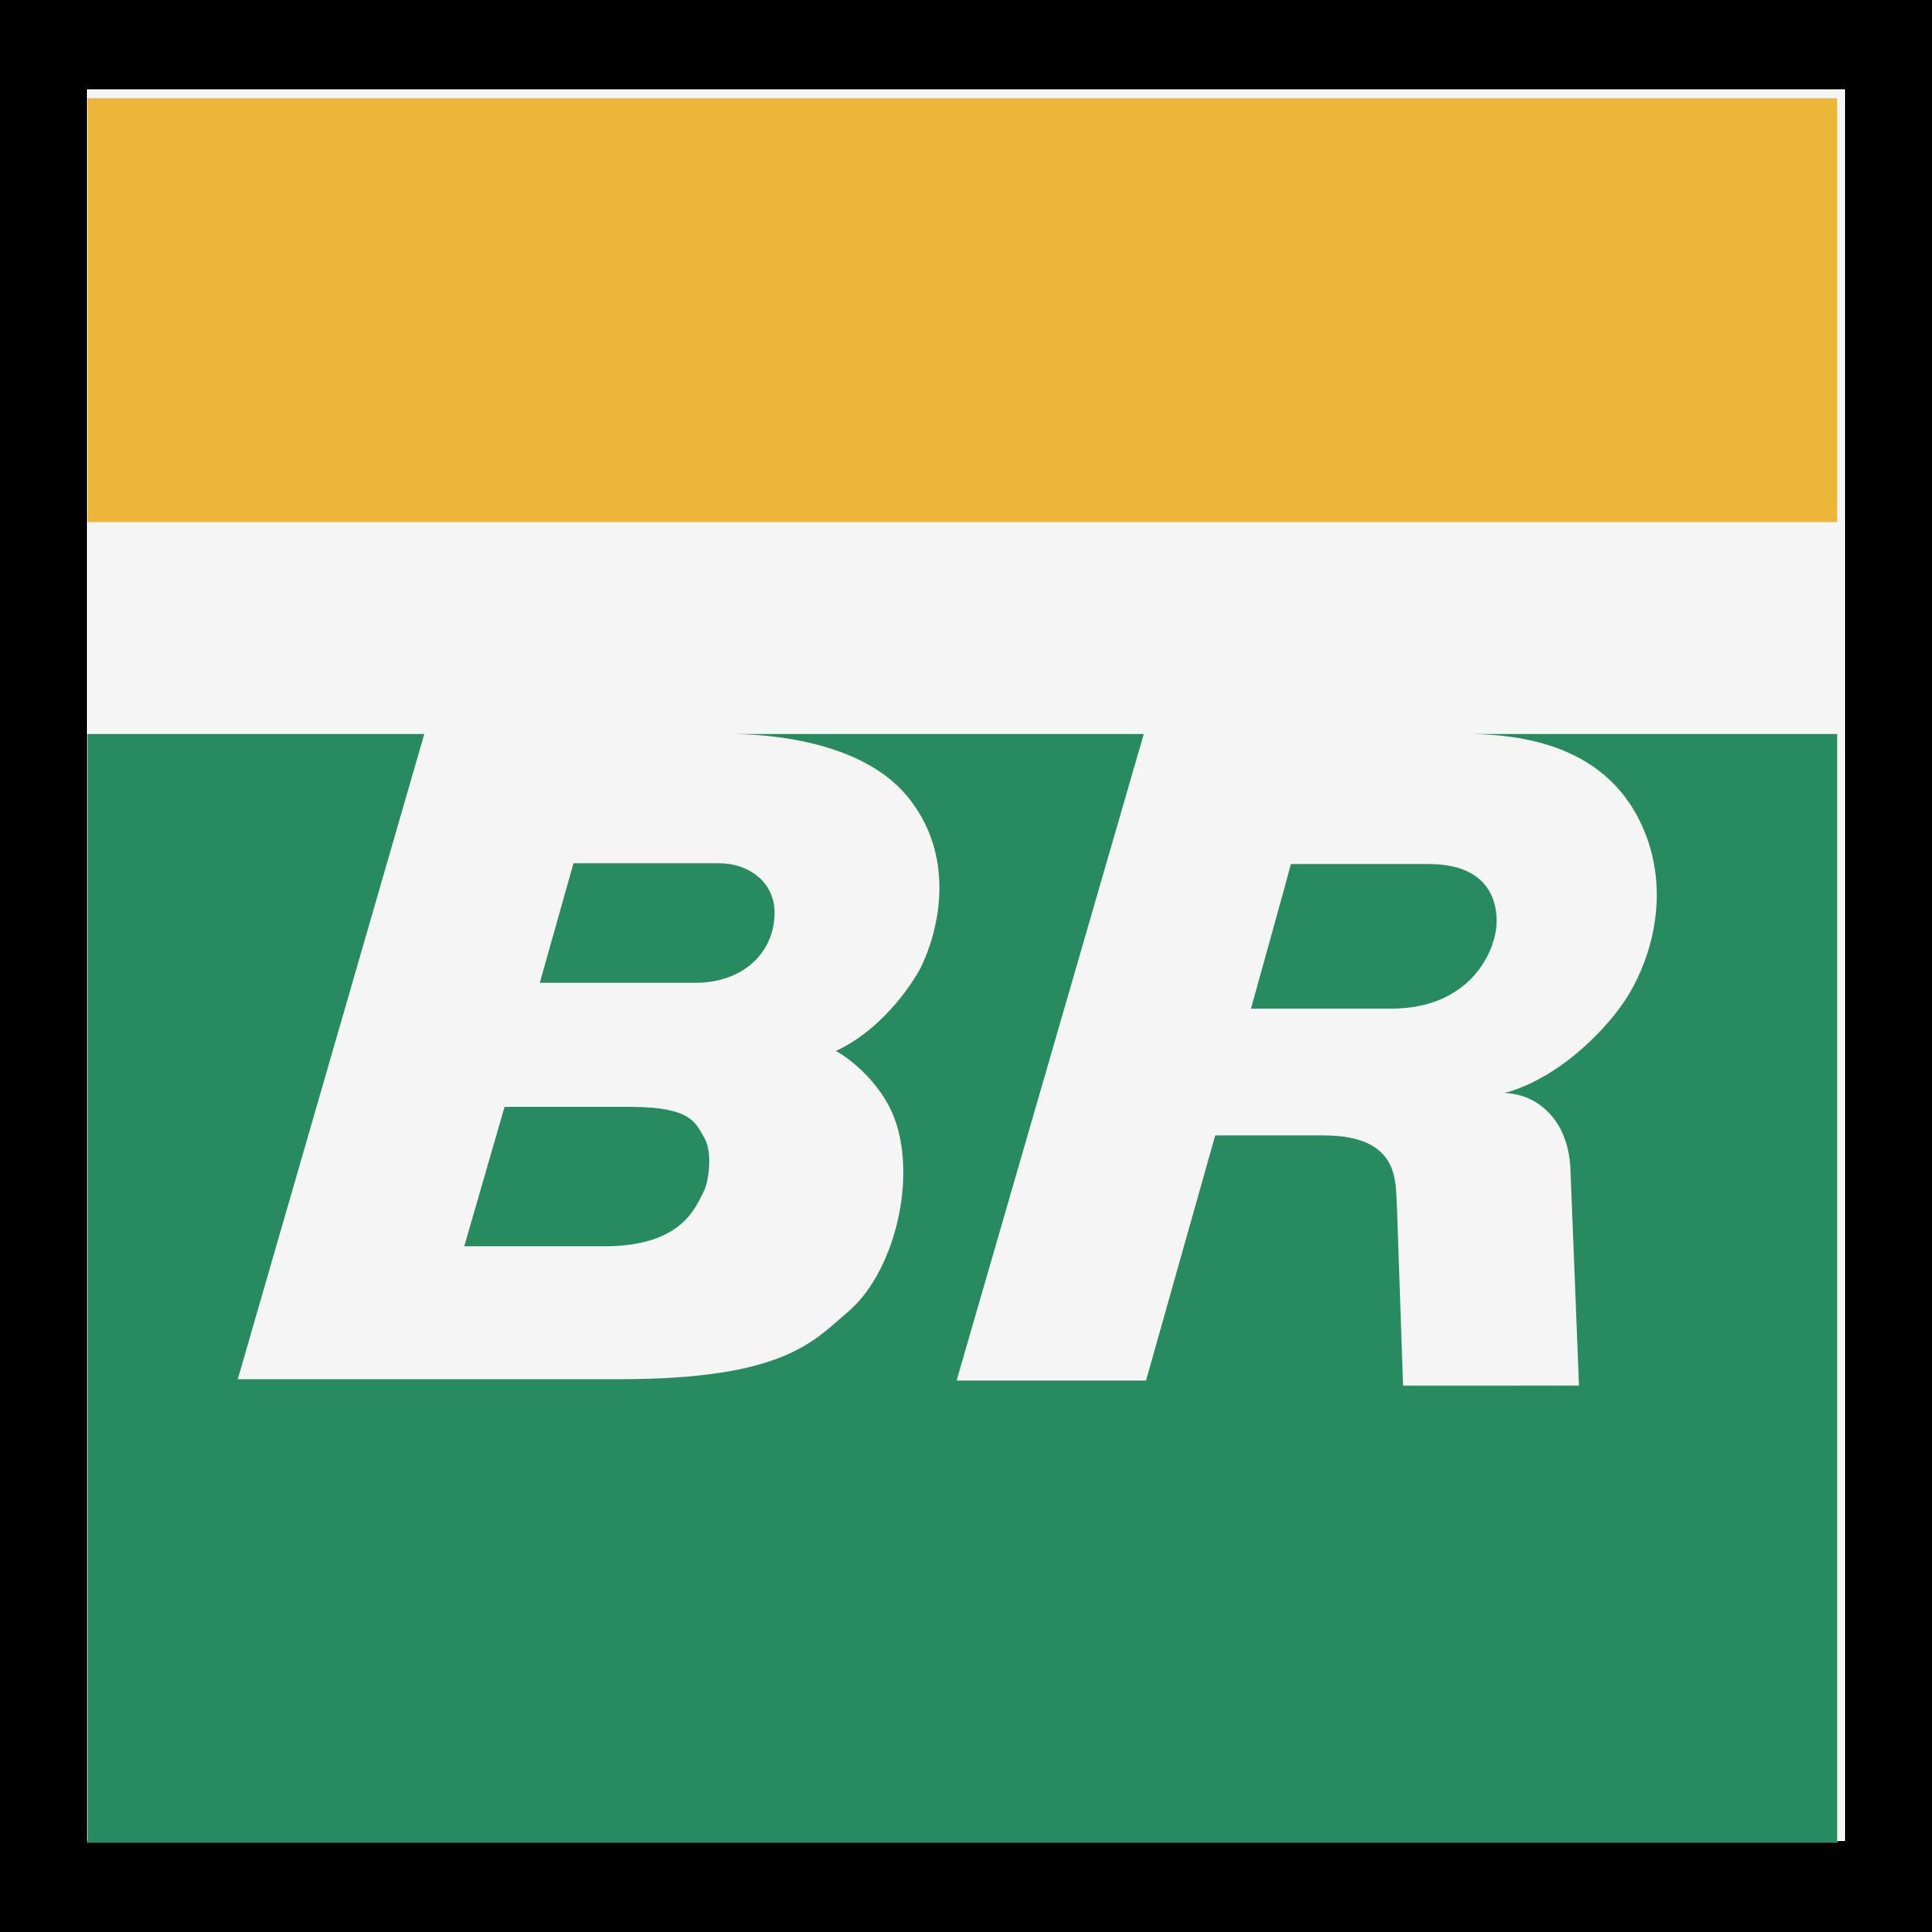 petrobras-8-logo-png-transparent (1)